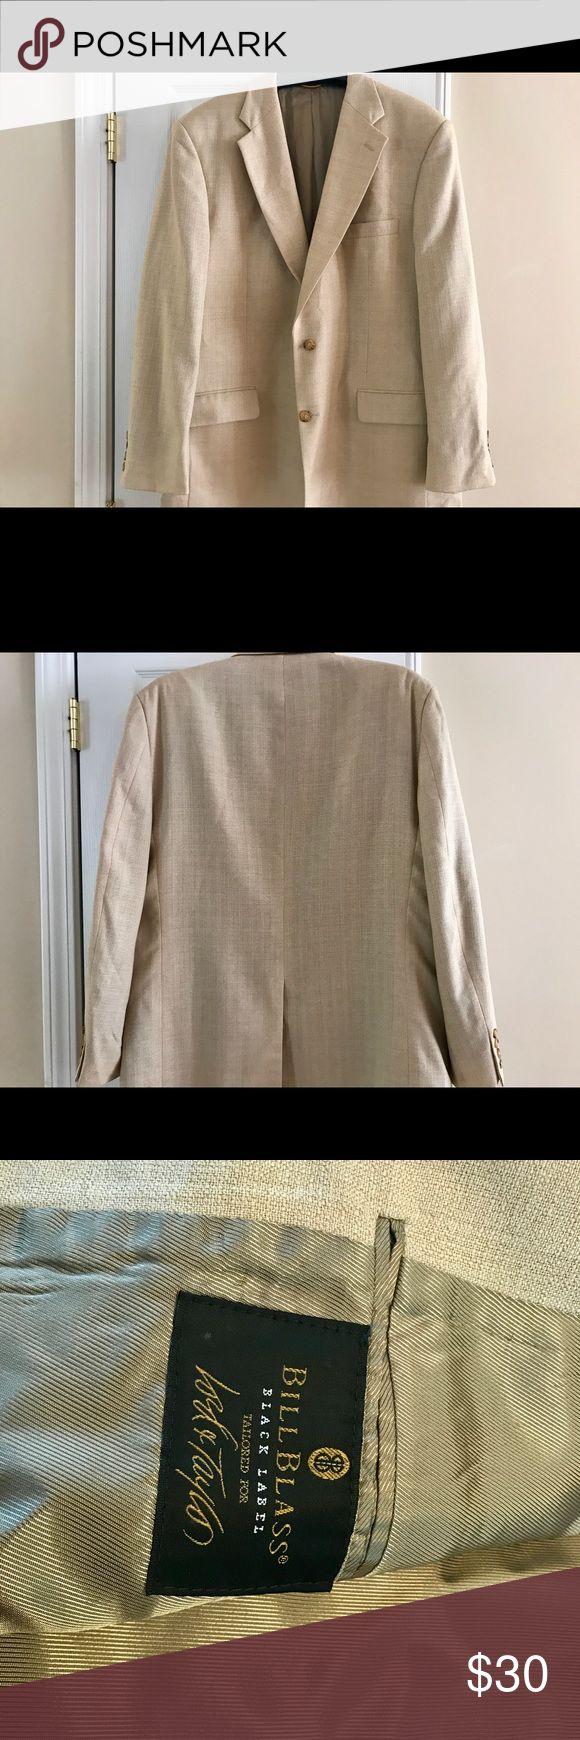 Men's Sport Coat 44 long. Bill Blass Black Label Men's Sport Coat 44 long. Bill Blass Black Label tailored for Lord & Taylor. Very good condition Bill Blass Black Label Suits & Blazers Sport Coats & Blazers